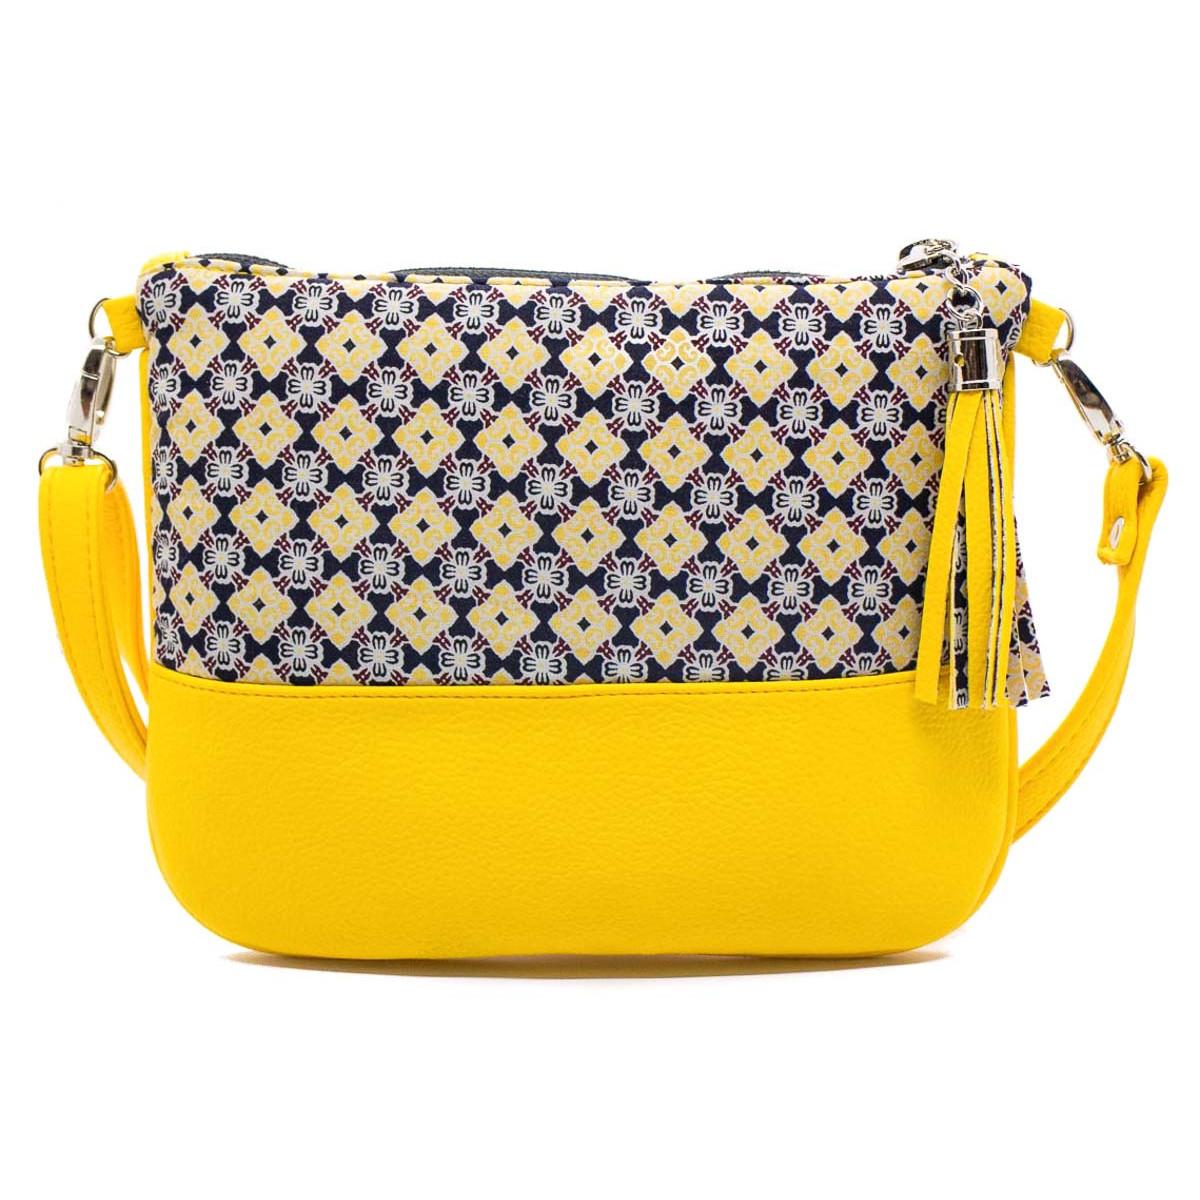 Sac à main pochette femme jaune et bleu